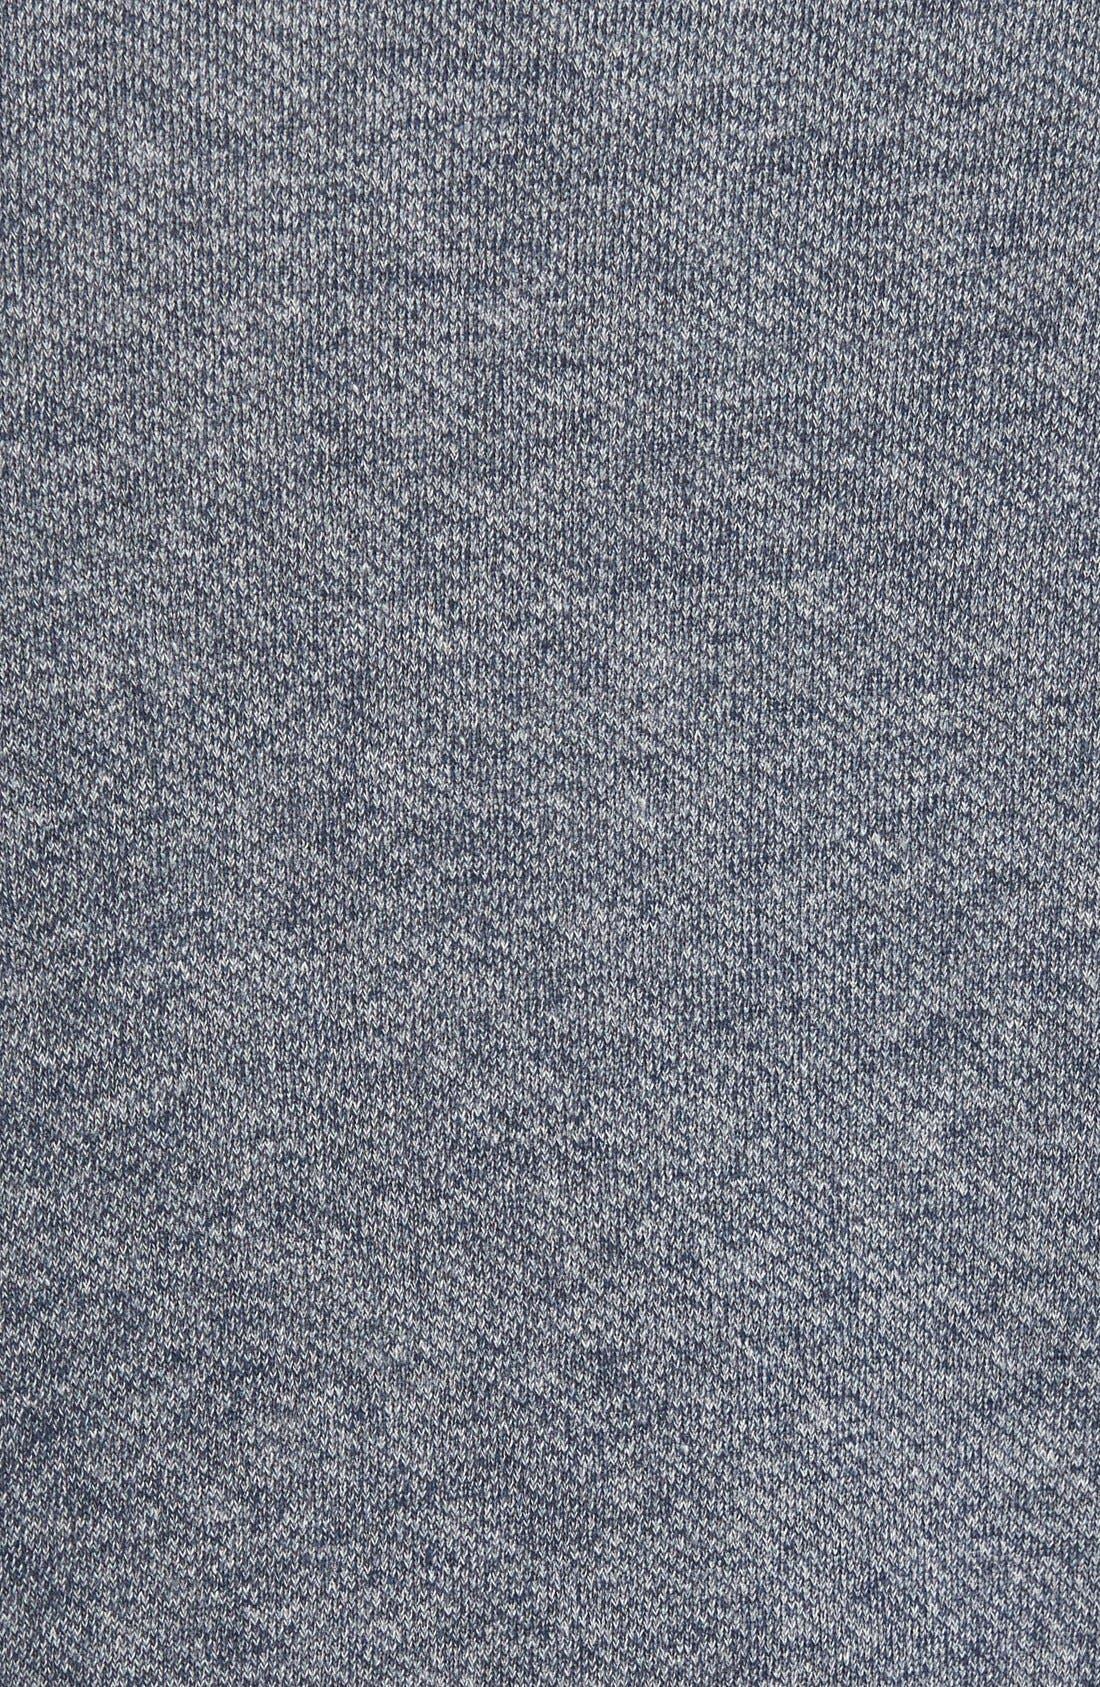 Alternate Image 5  - Billy Reid 'Shiloh' Shawl Collar Sweatshirt